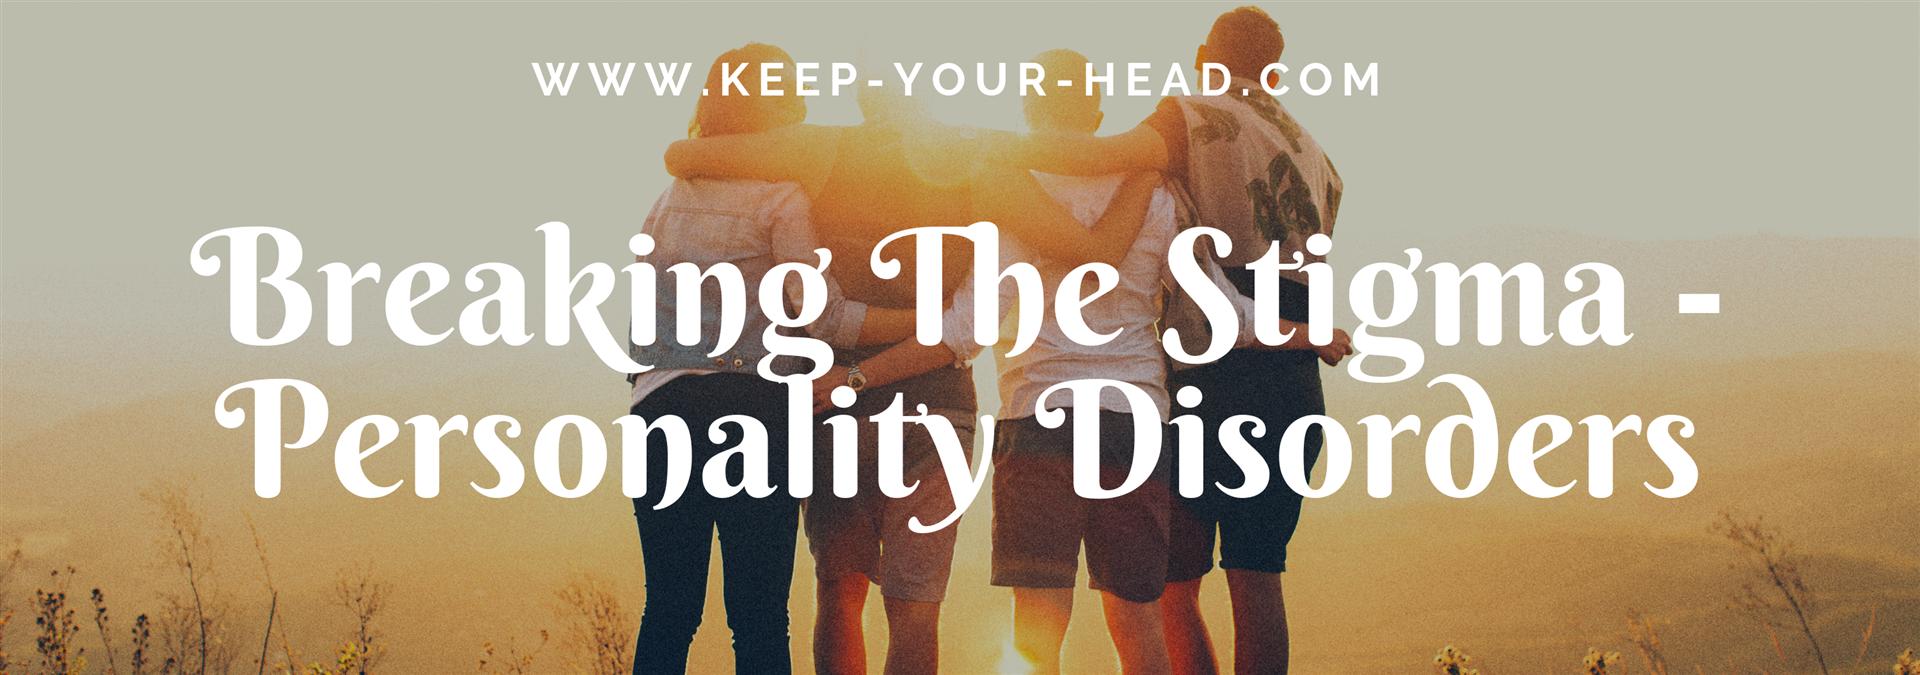 Personality Disorders stigma